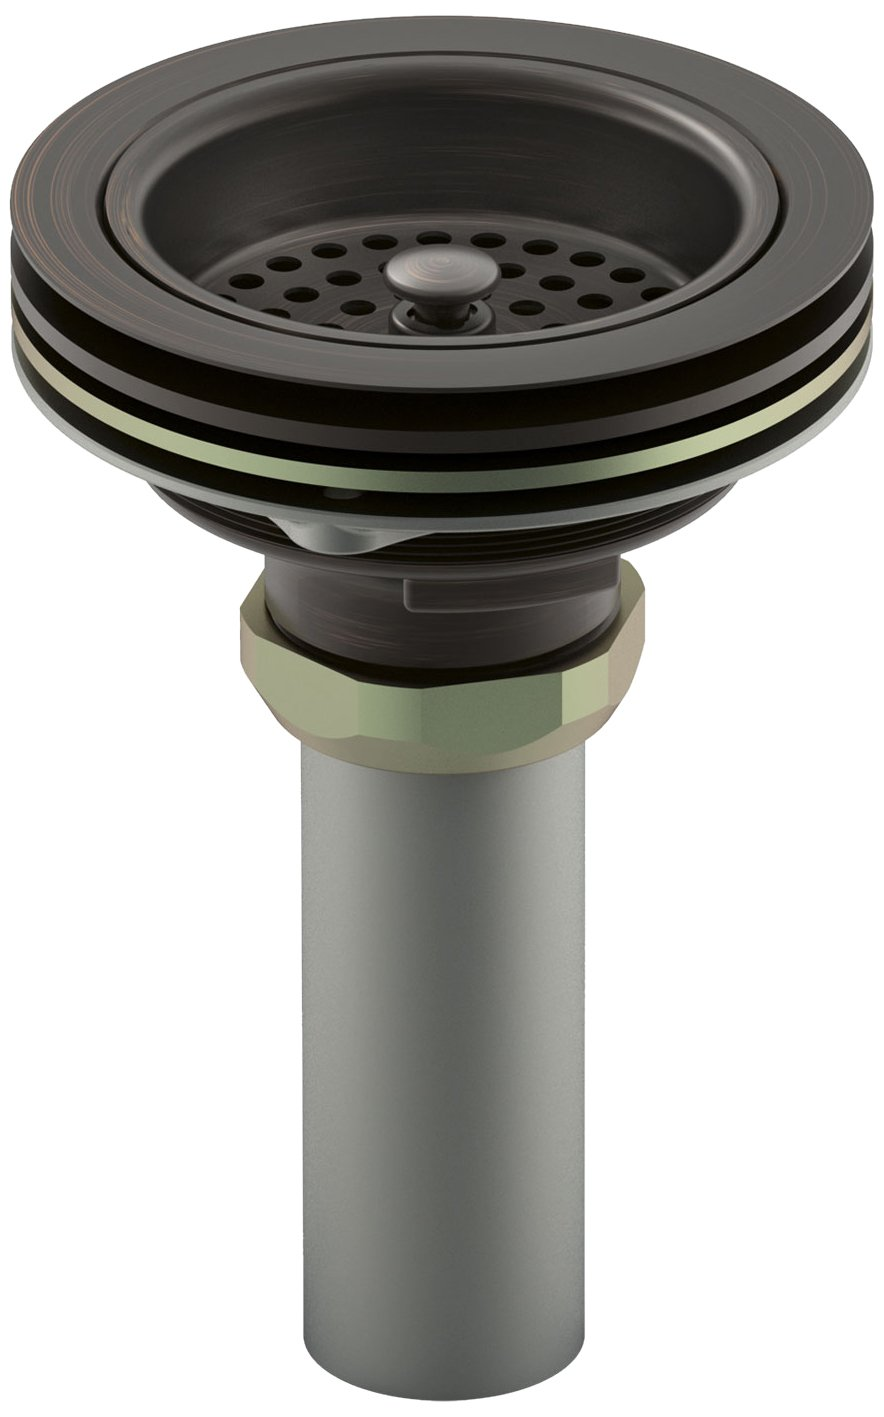 Kohler K-8801-2BZ Duostrainer Sink Strainer, Oil Rubbed Bronze